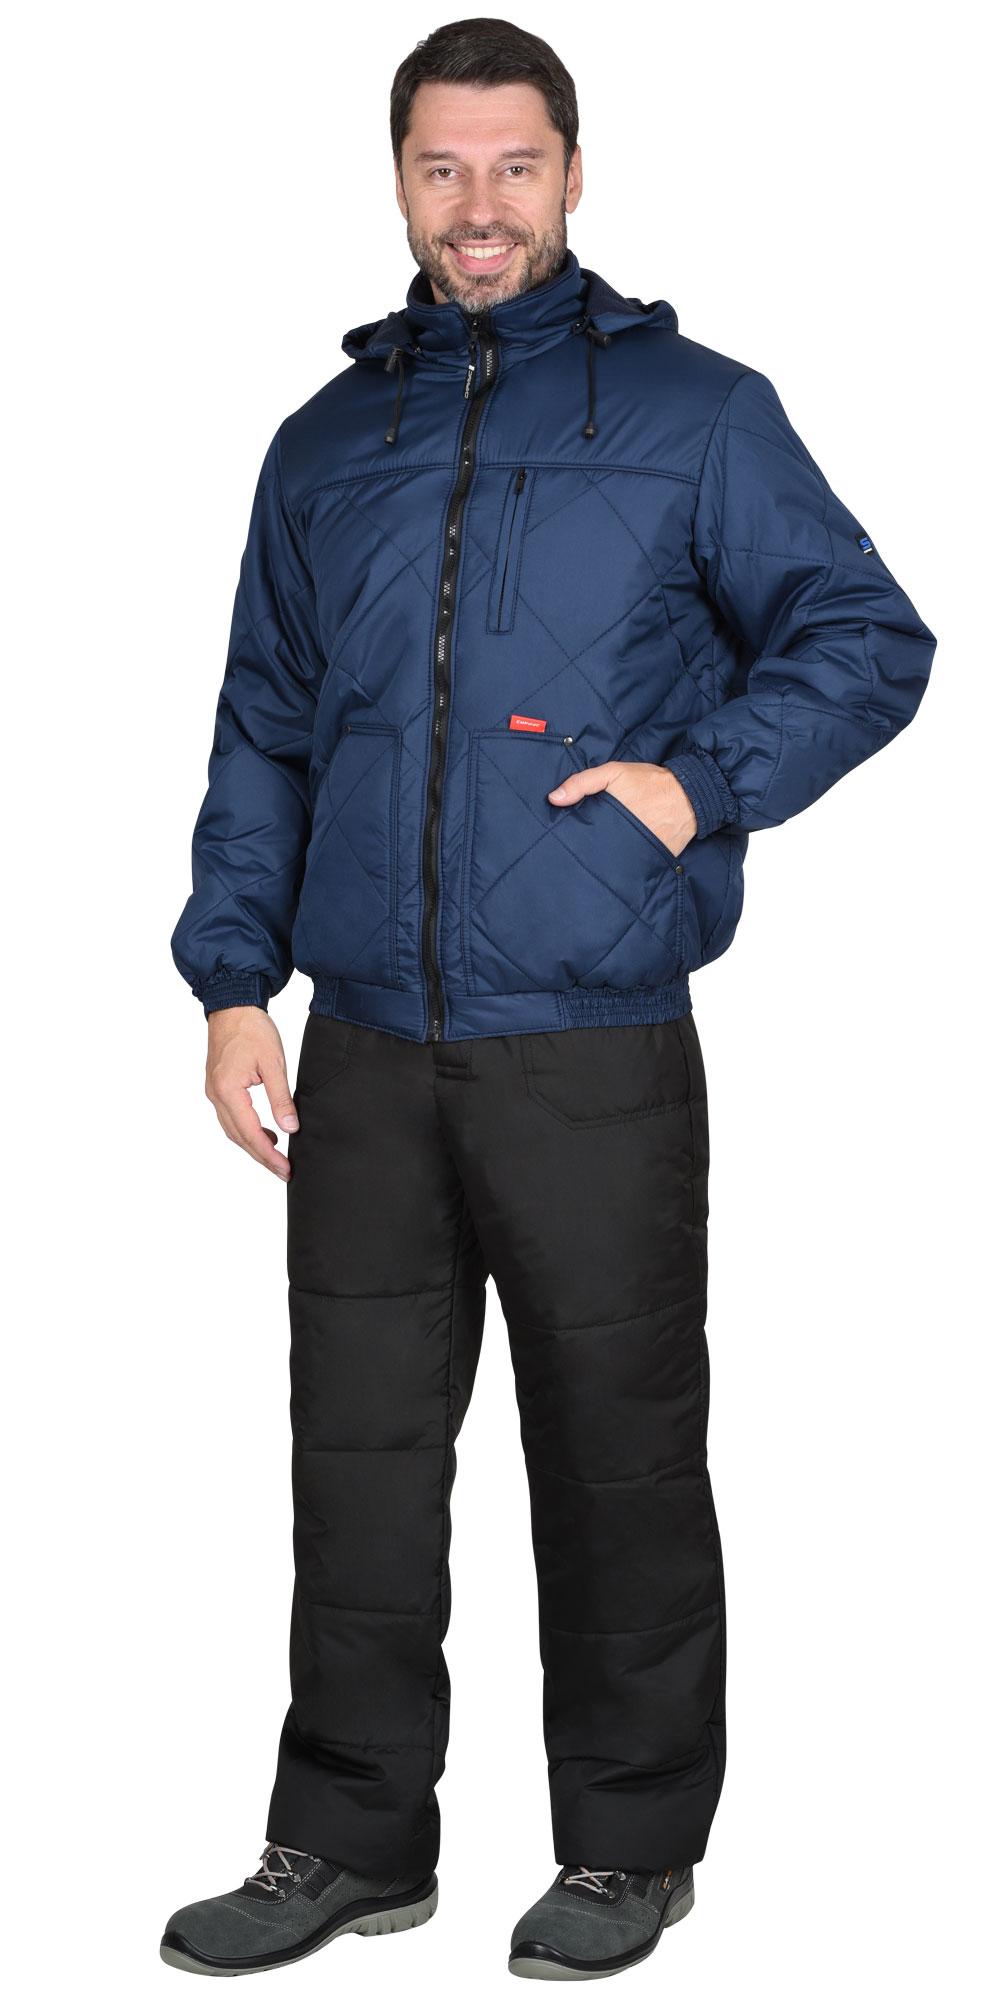 Куртка «Зодиак-прага люкс» ЦЕНА: 1530.00